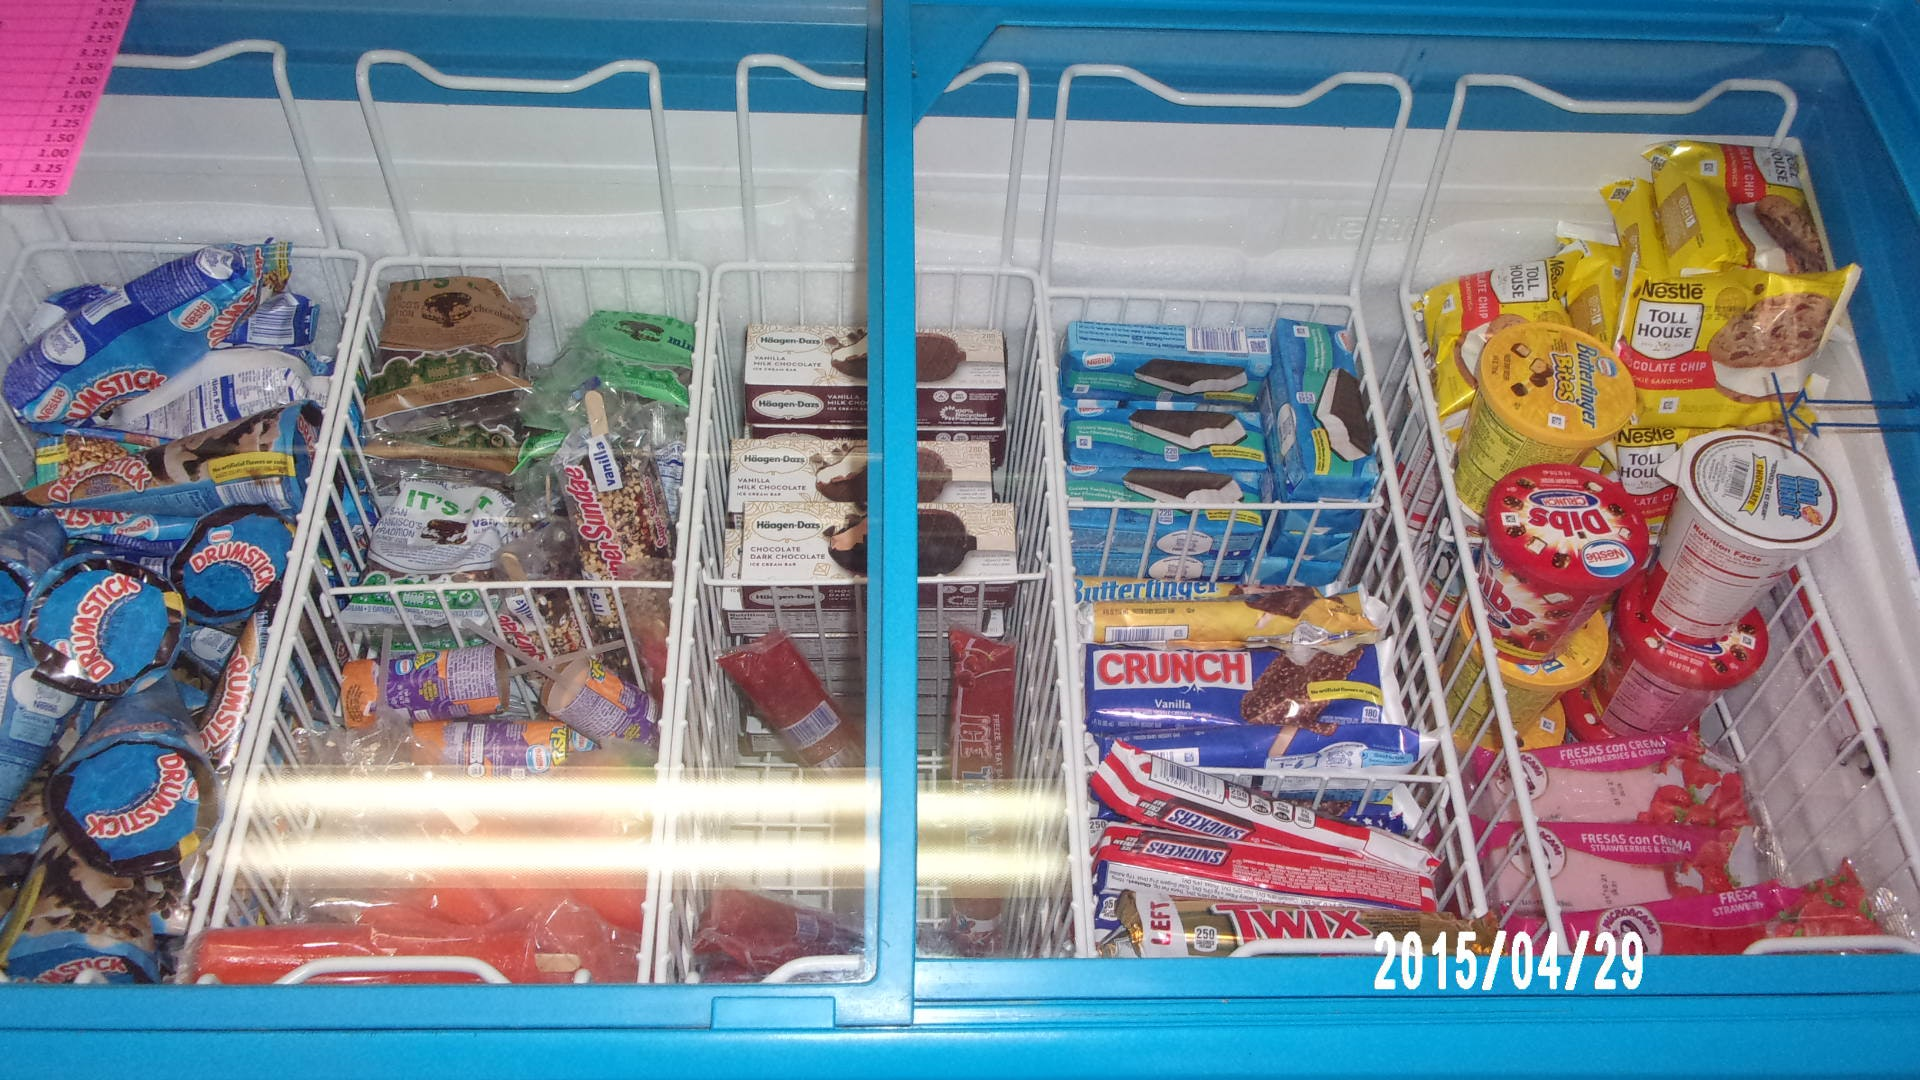 May contain: shelf